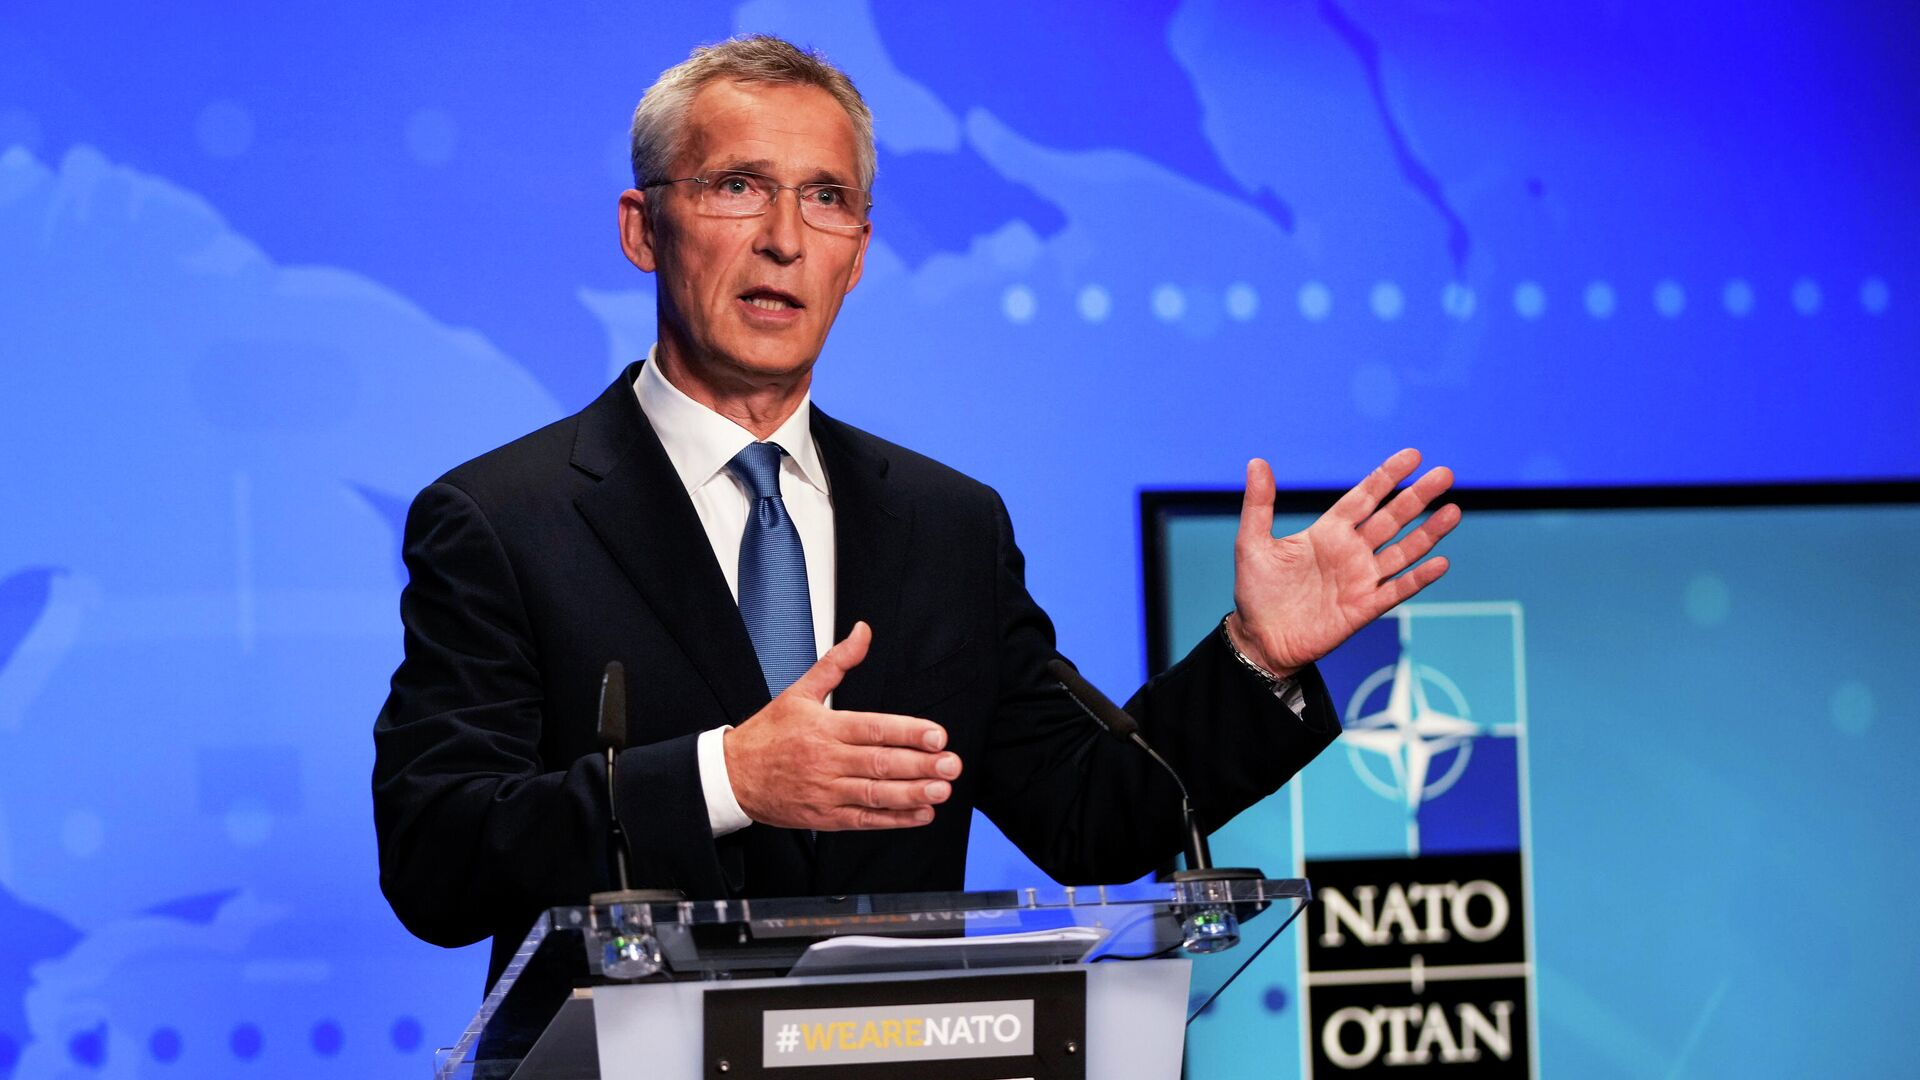 Generalni sekretar NATO-a Jens Stoltenberg - Sputnik Srbija, 1920, 06.09.2021